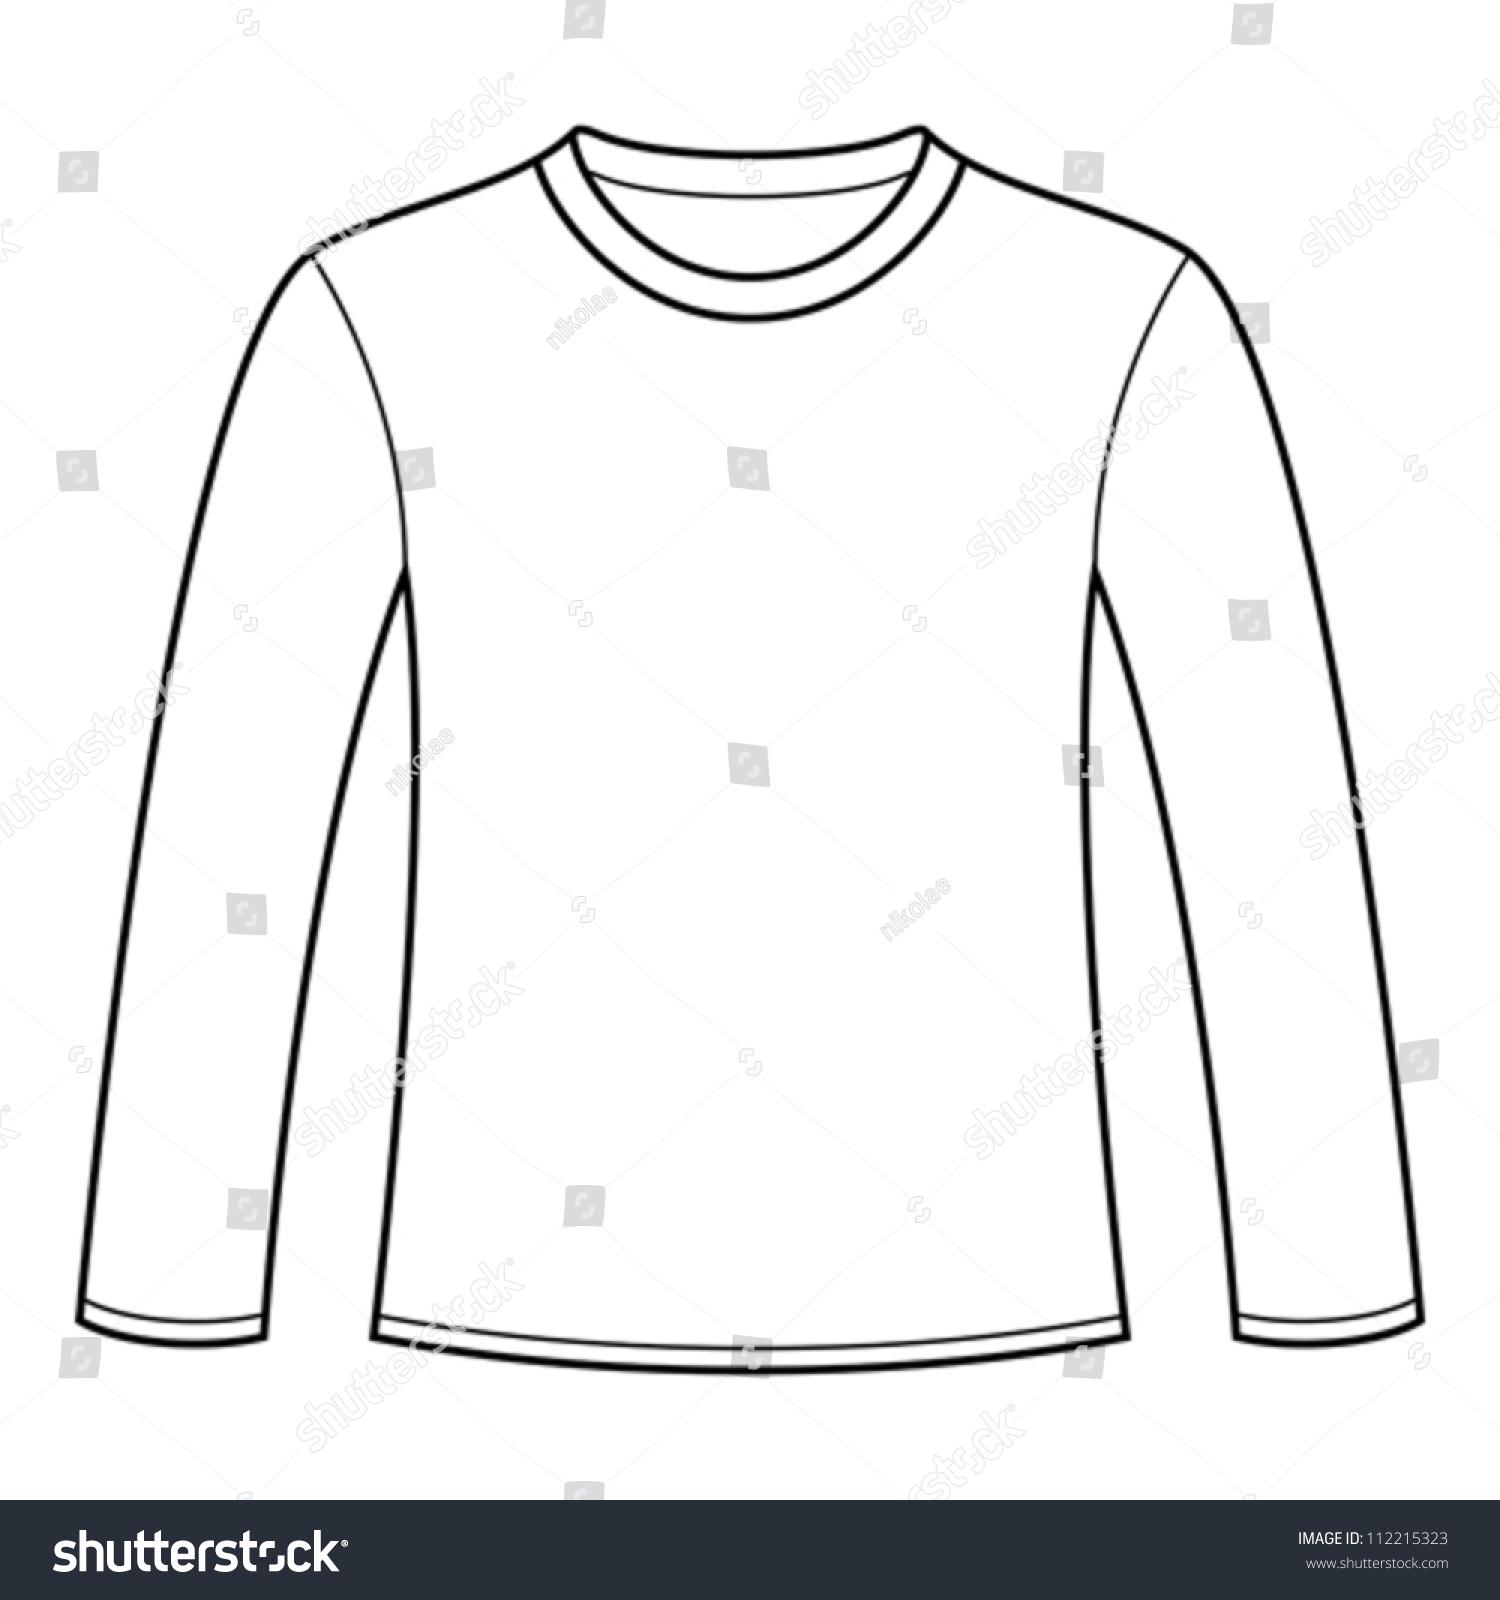 longsleeved tshirt template stock vector 112215323 shutterstock. Black Bedroom Furniture Sets. Home Design Ideas